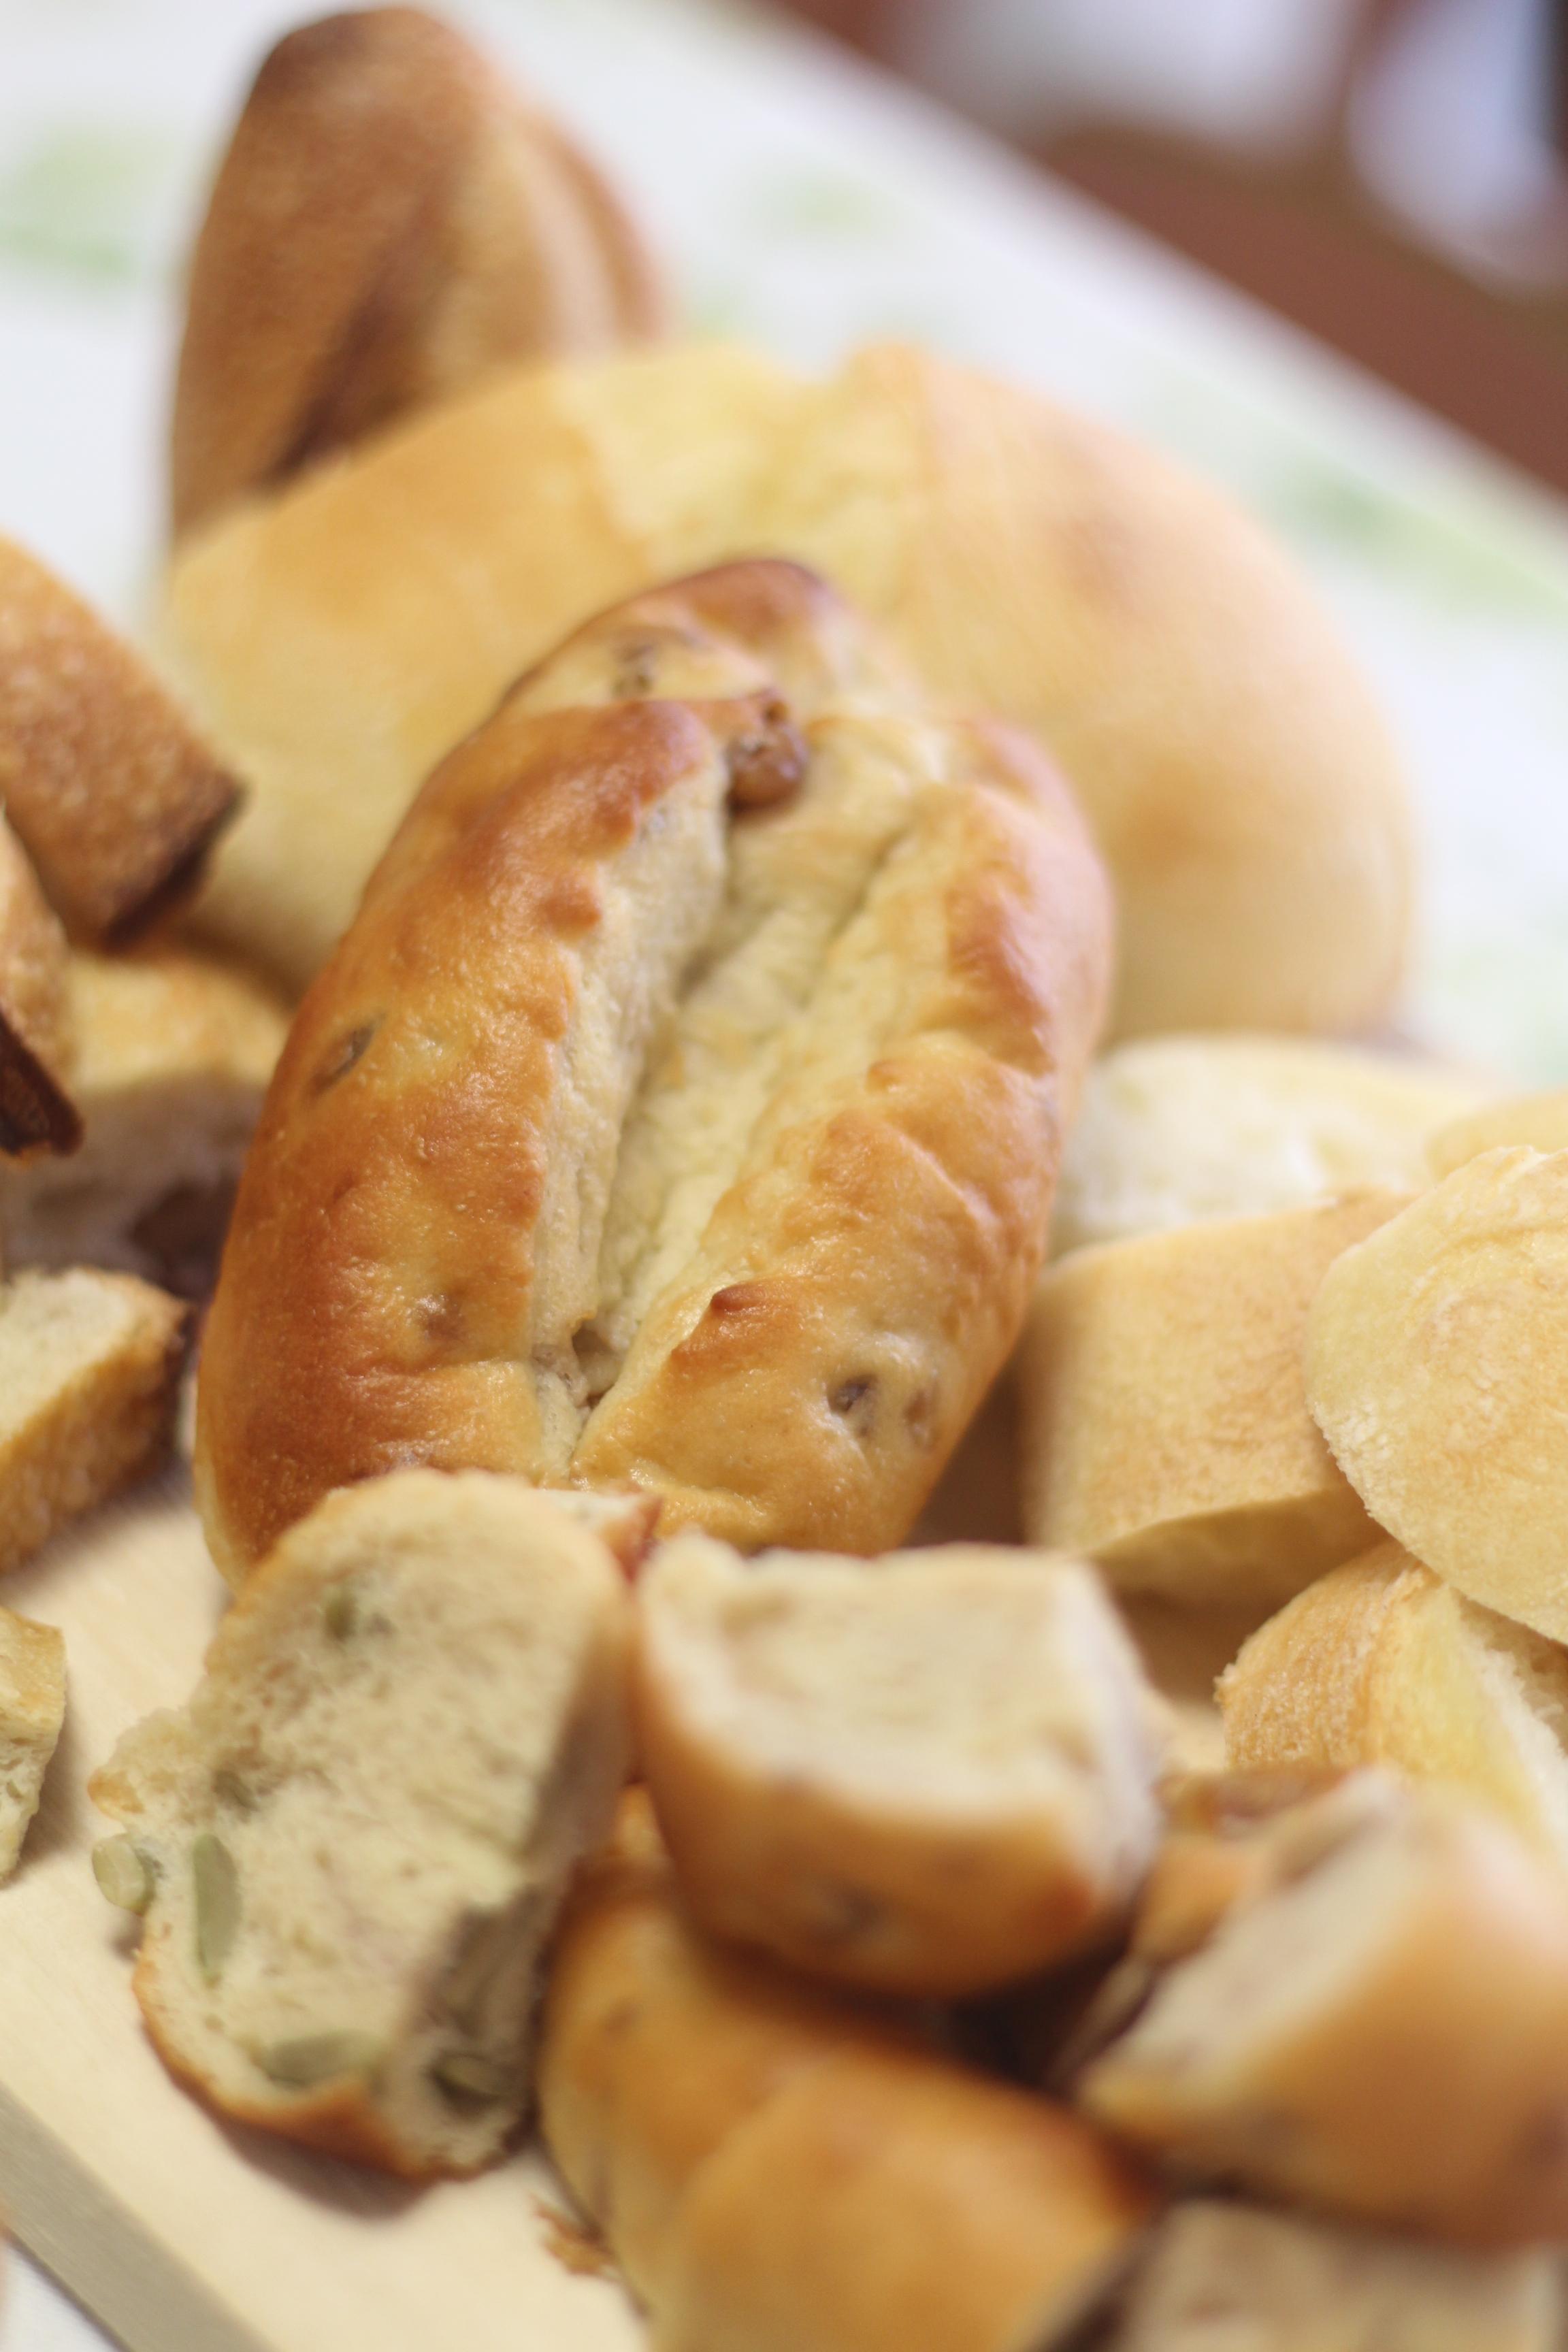 a-ta-sante糖質制限パン・料理教室、阿部肉西田辺。京都江部粉クルミパンで、チーズフォンデュ。アニバーサリー。